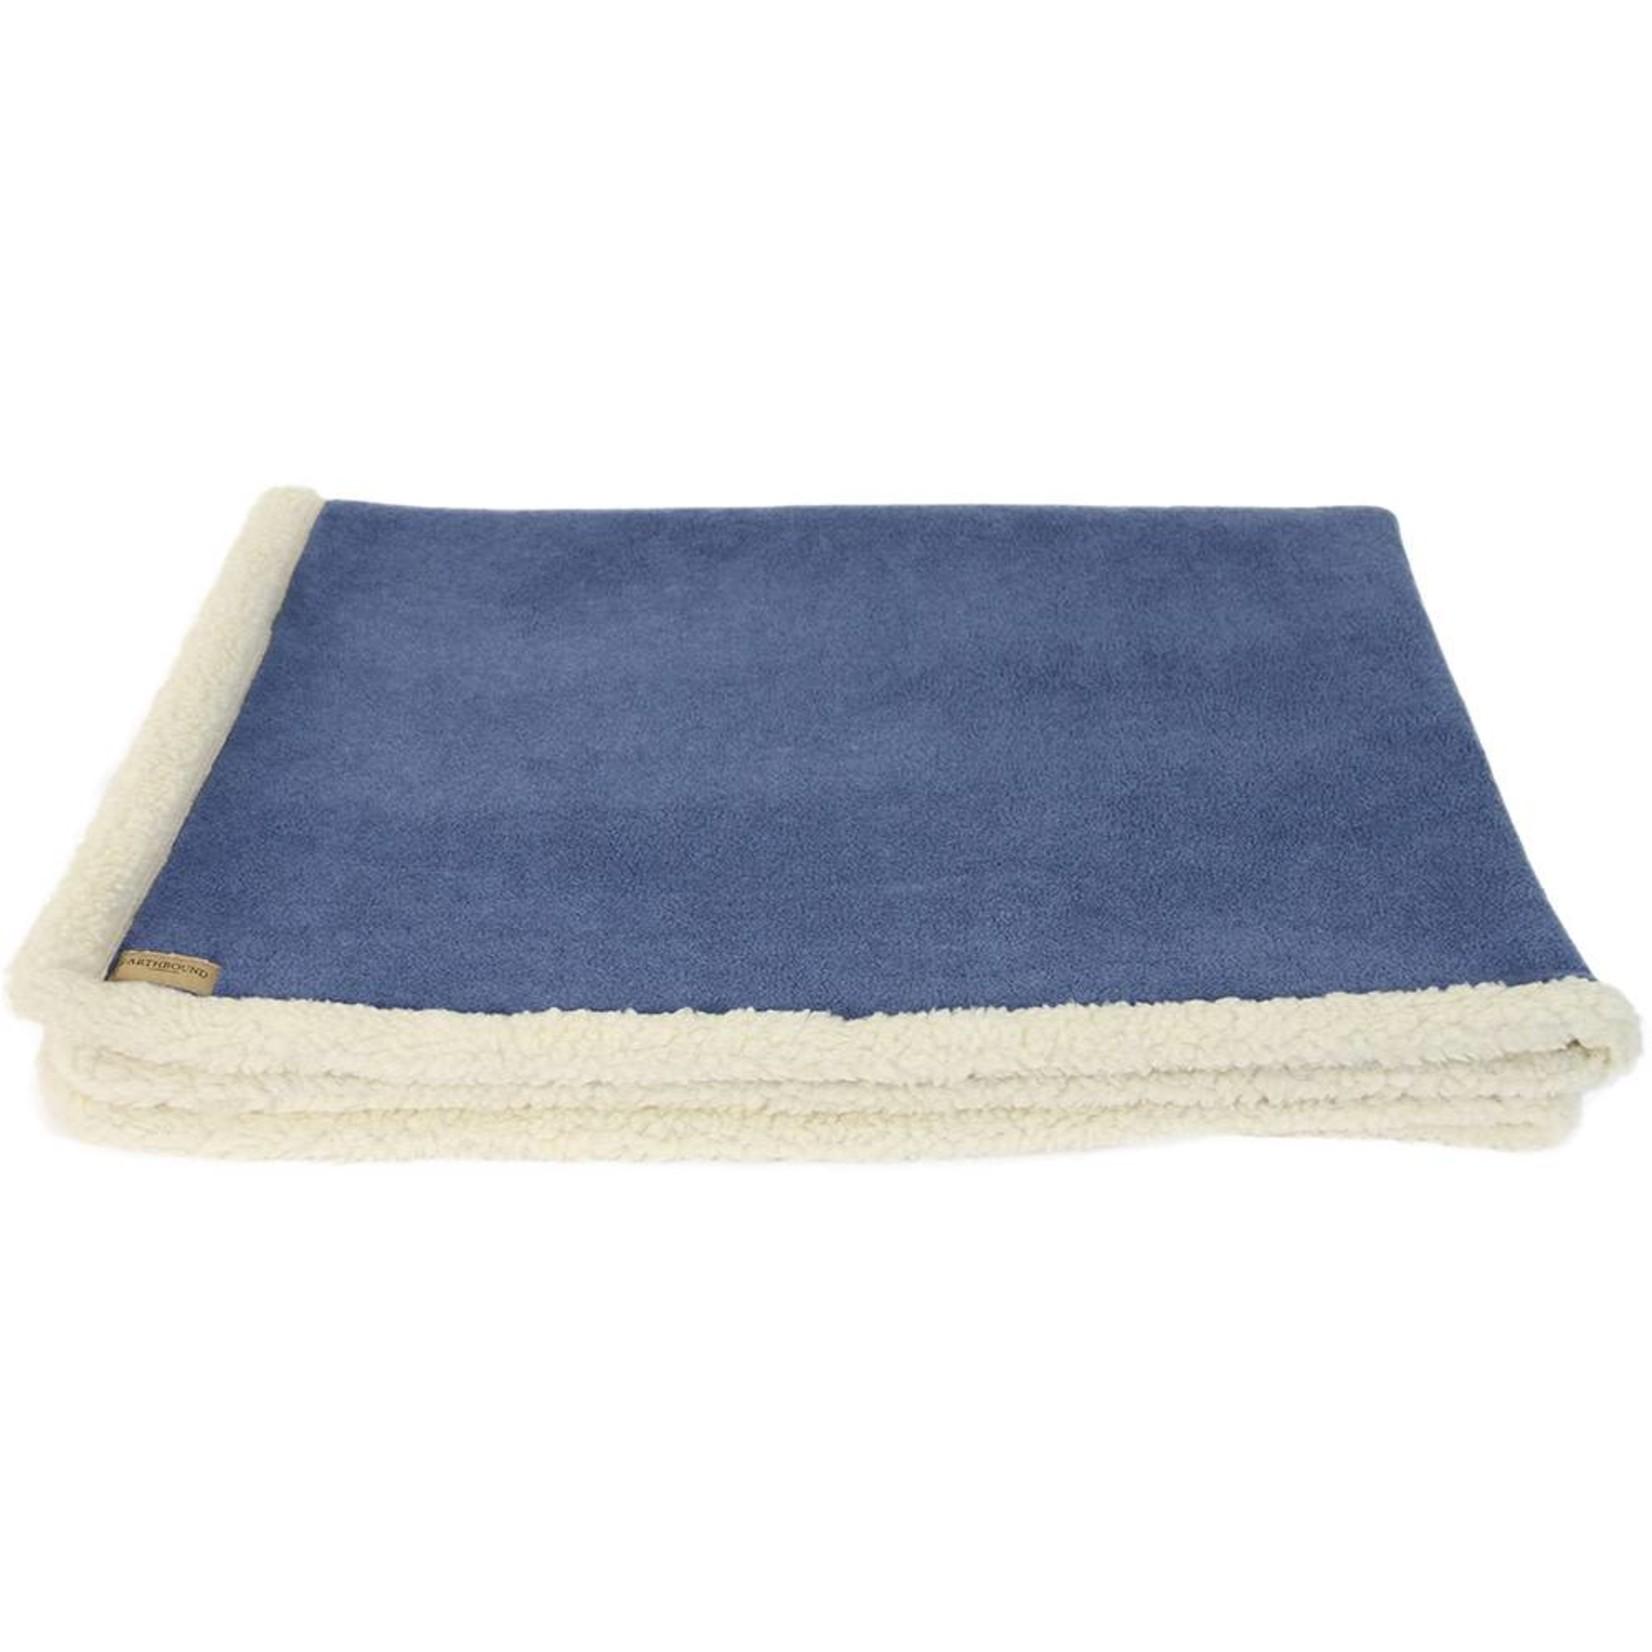 Earthbound Sherpa Pet Blanket, Denim Blue